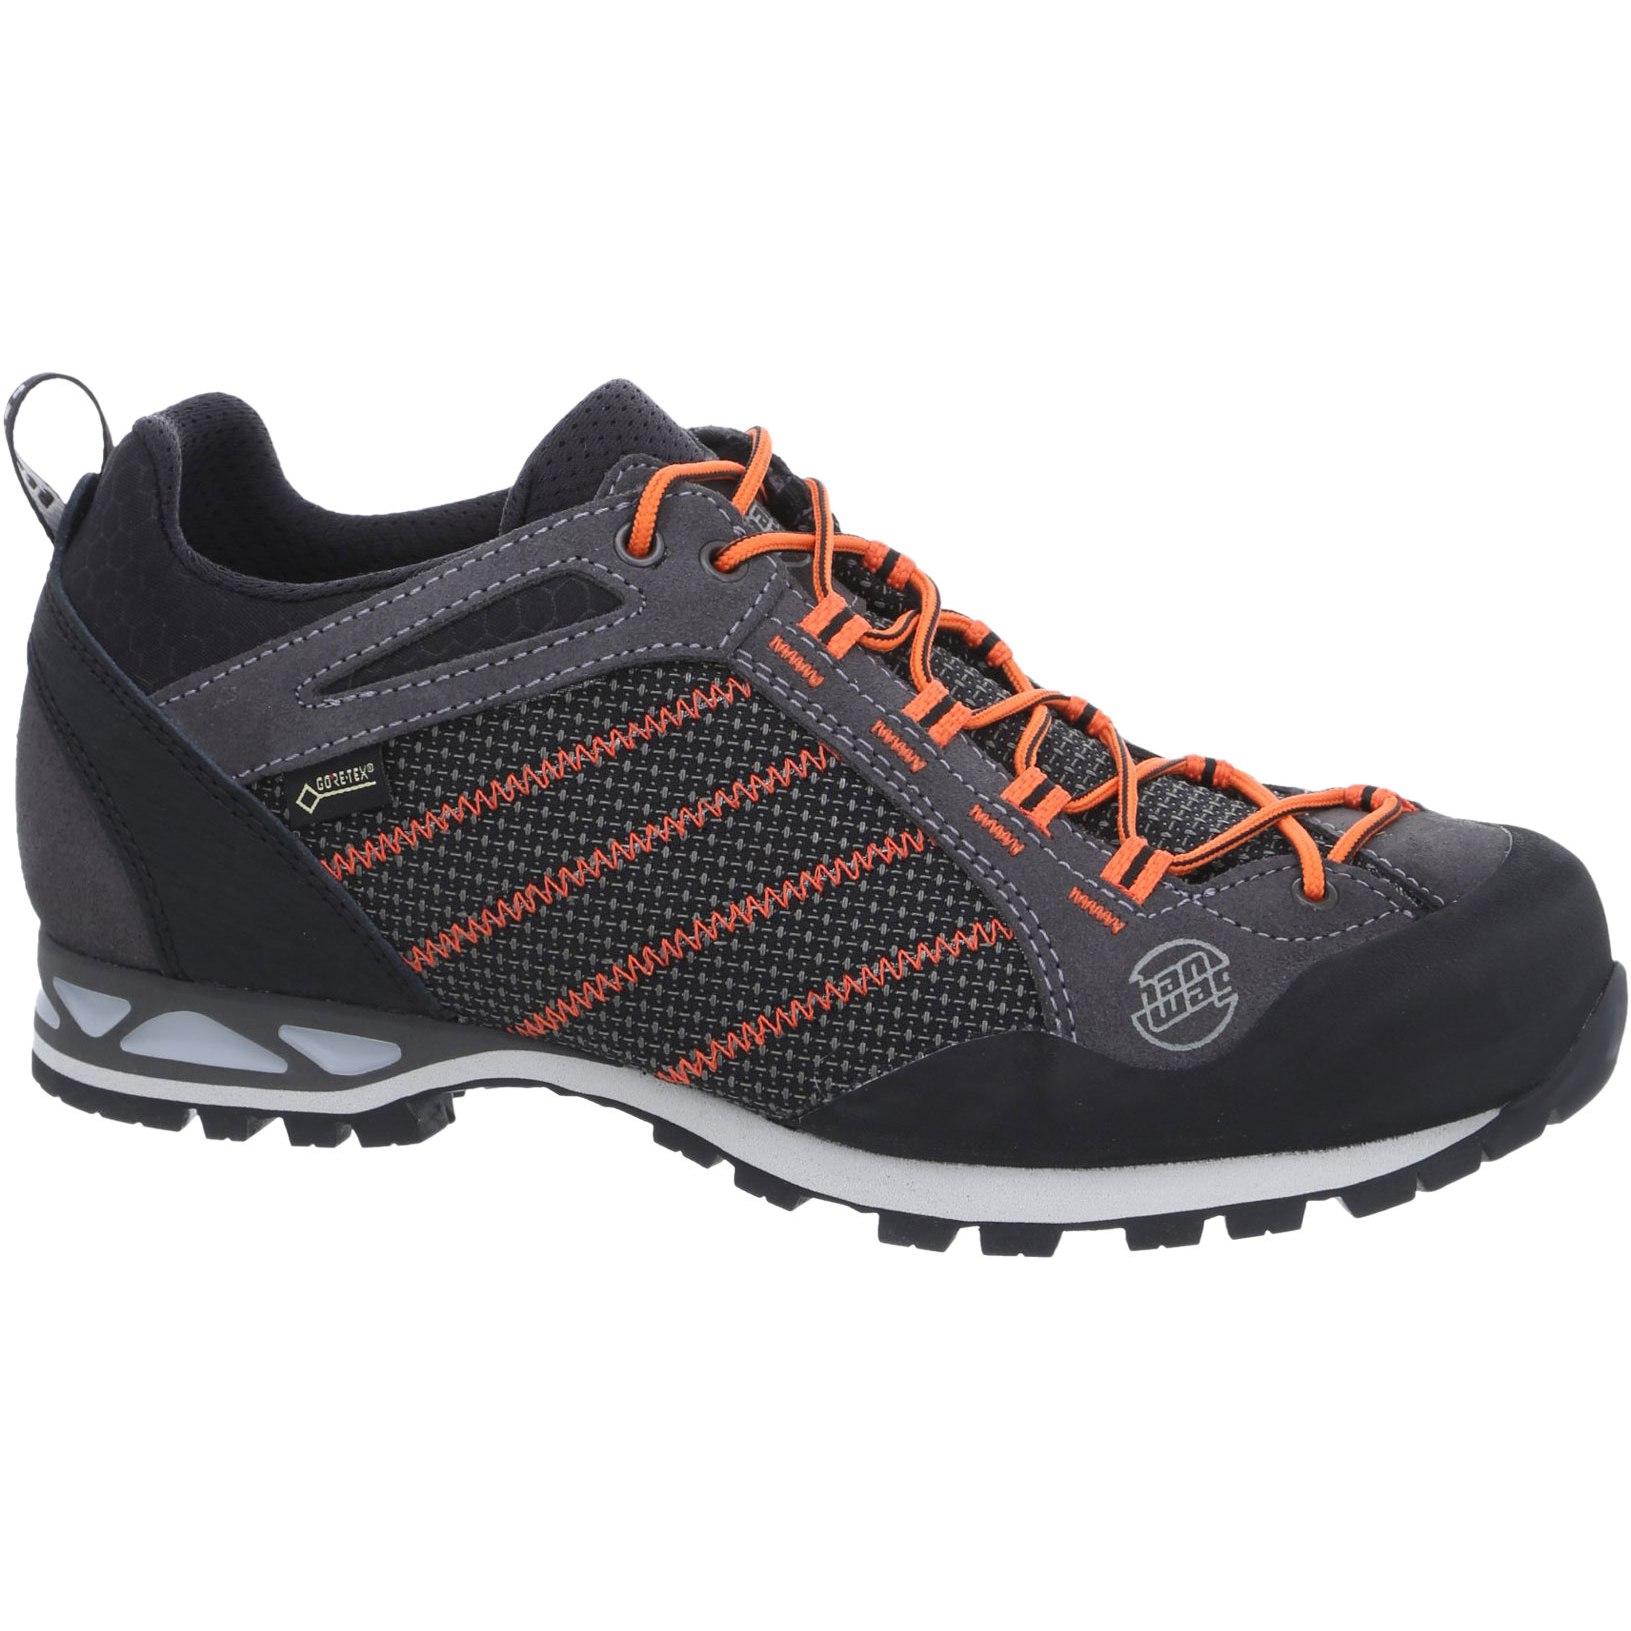 Hanwag Makra Low GTX Shoe - Asphalt/Orange